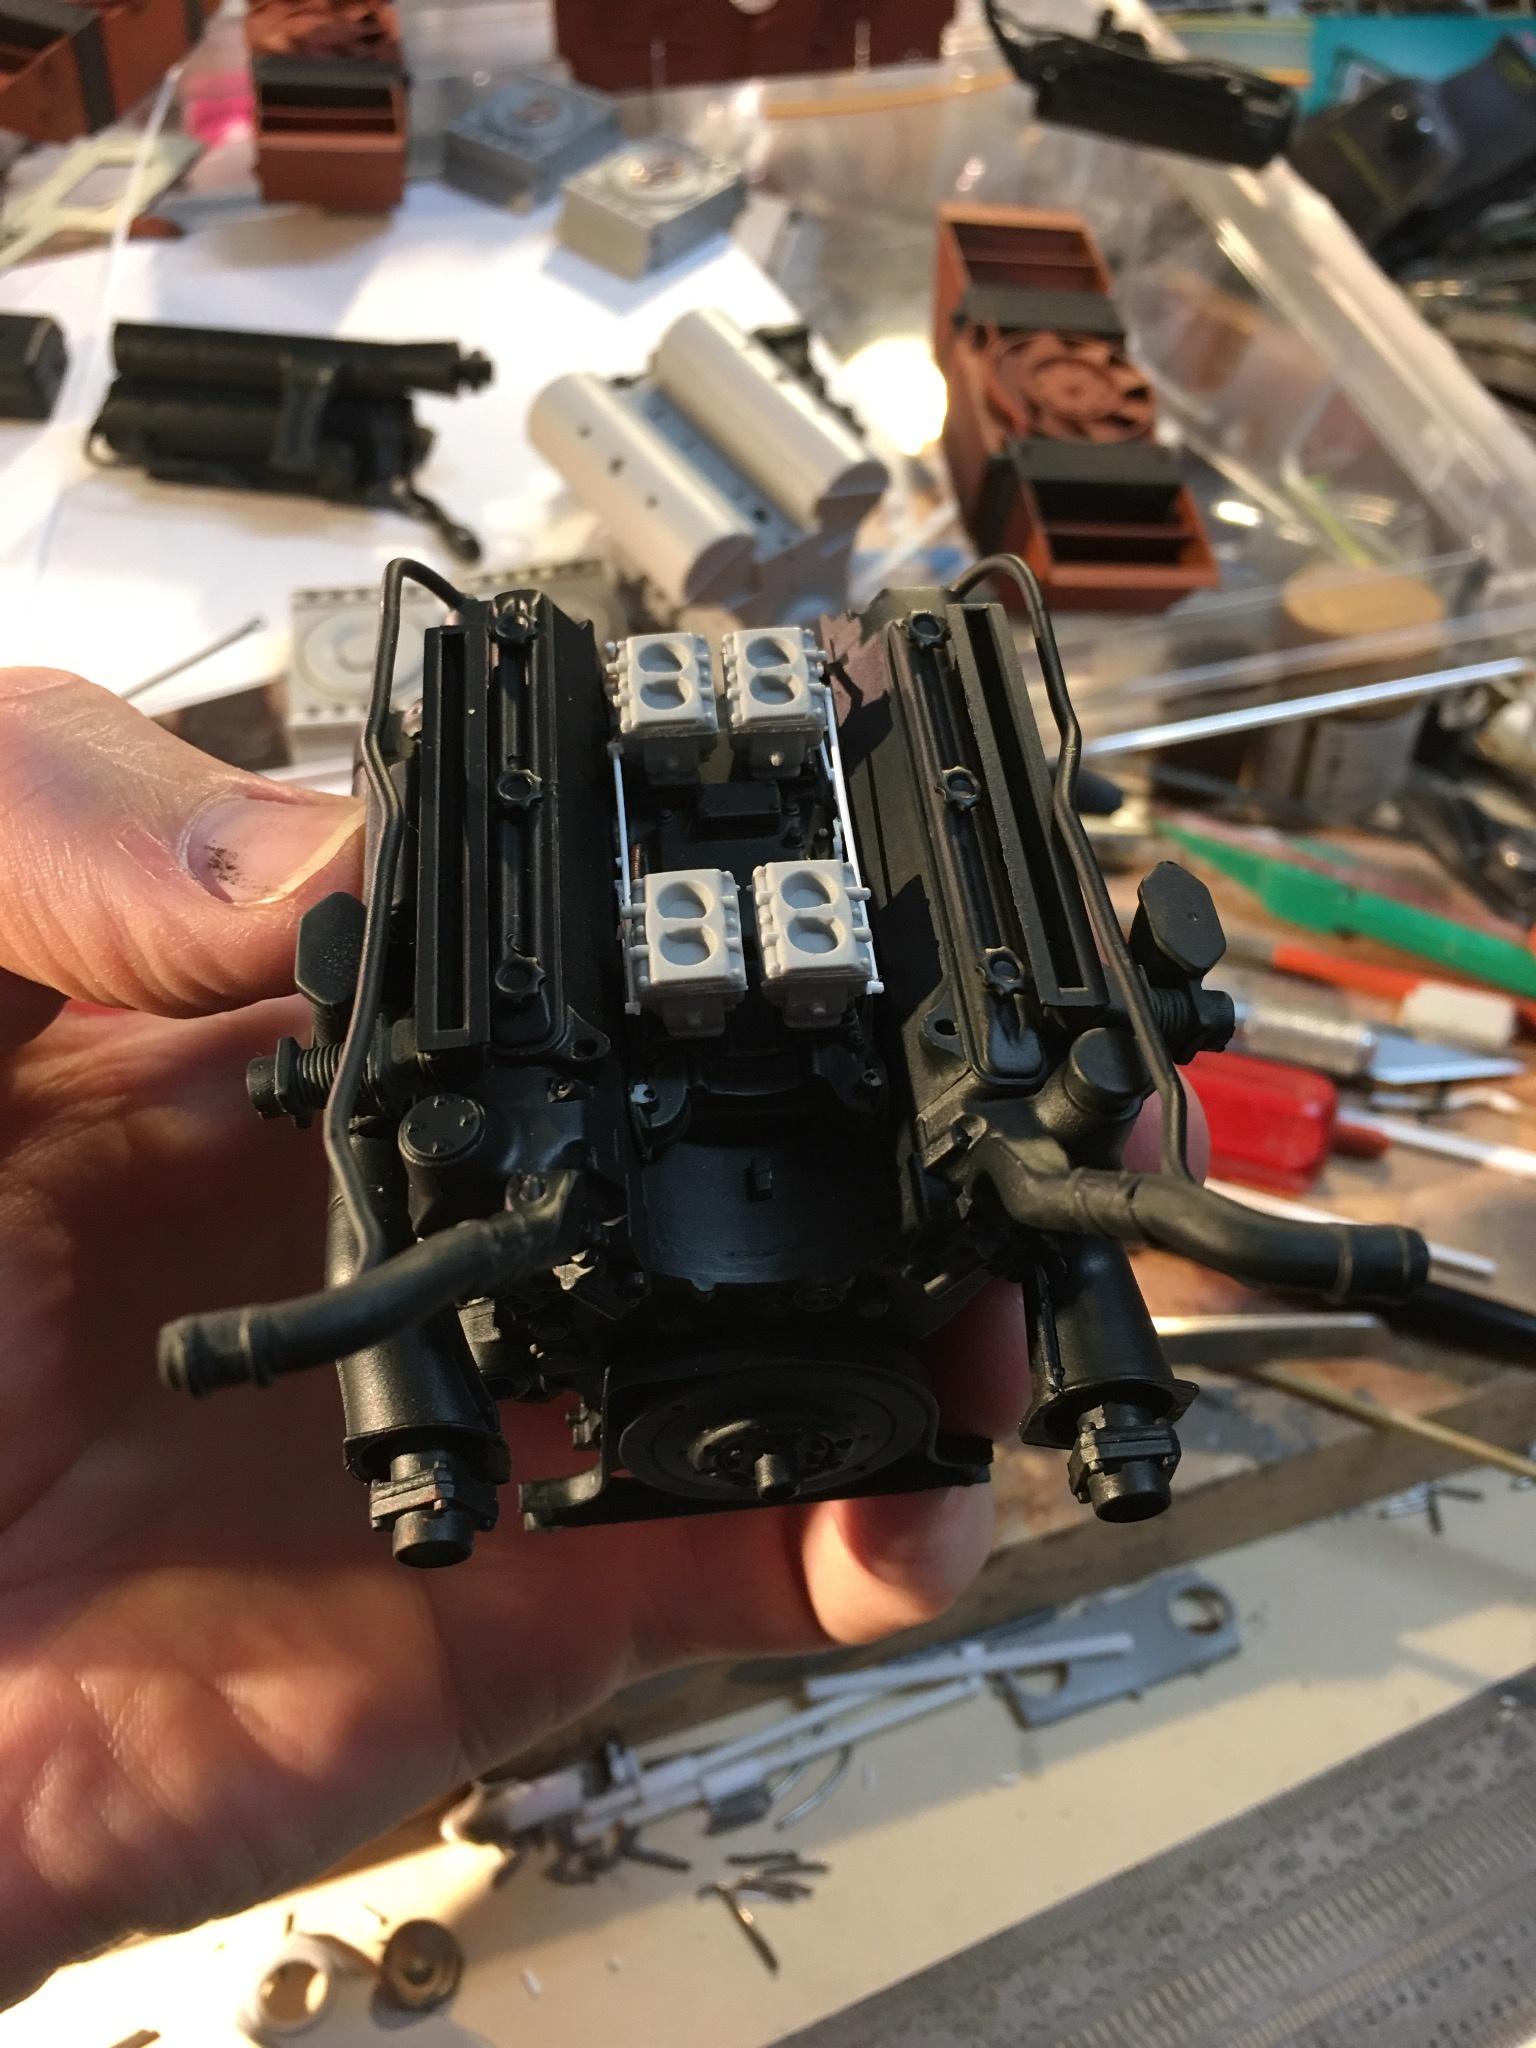 516E85BC-B305-45EC-8A3C-3BE80E261877.jpeg